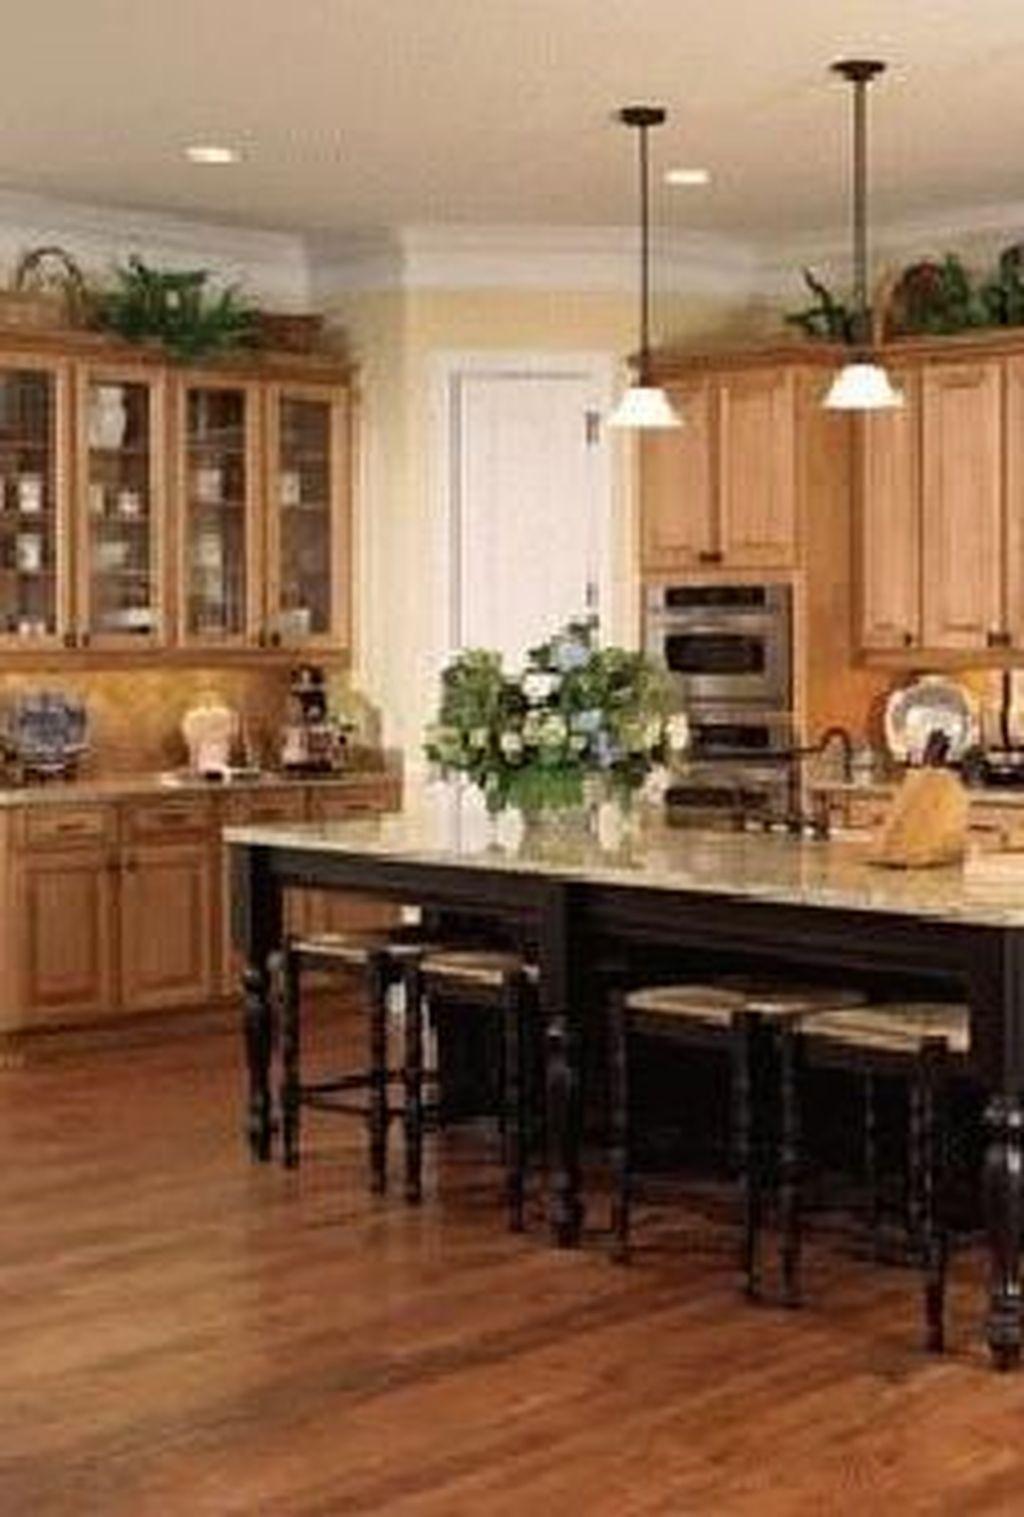 40 Popular Wood Kitchen Floor Design Ideas On A Budget To ...